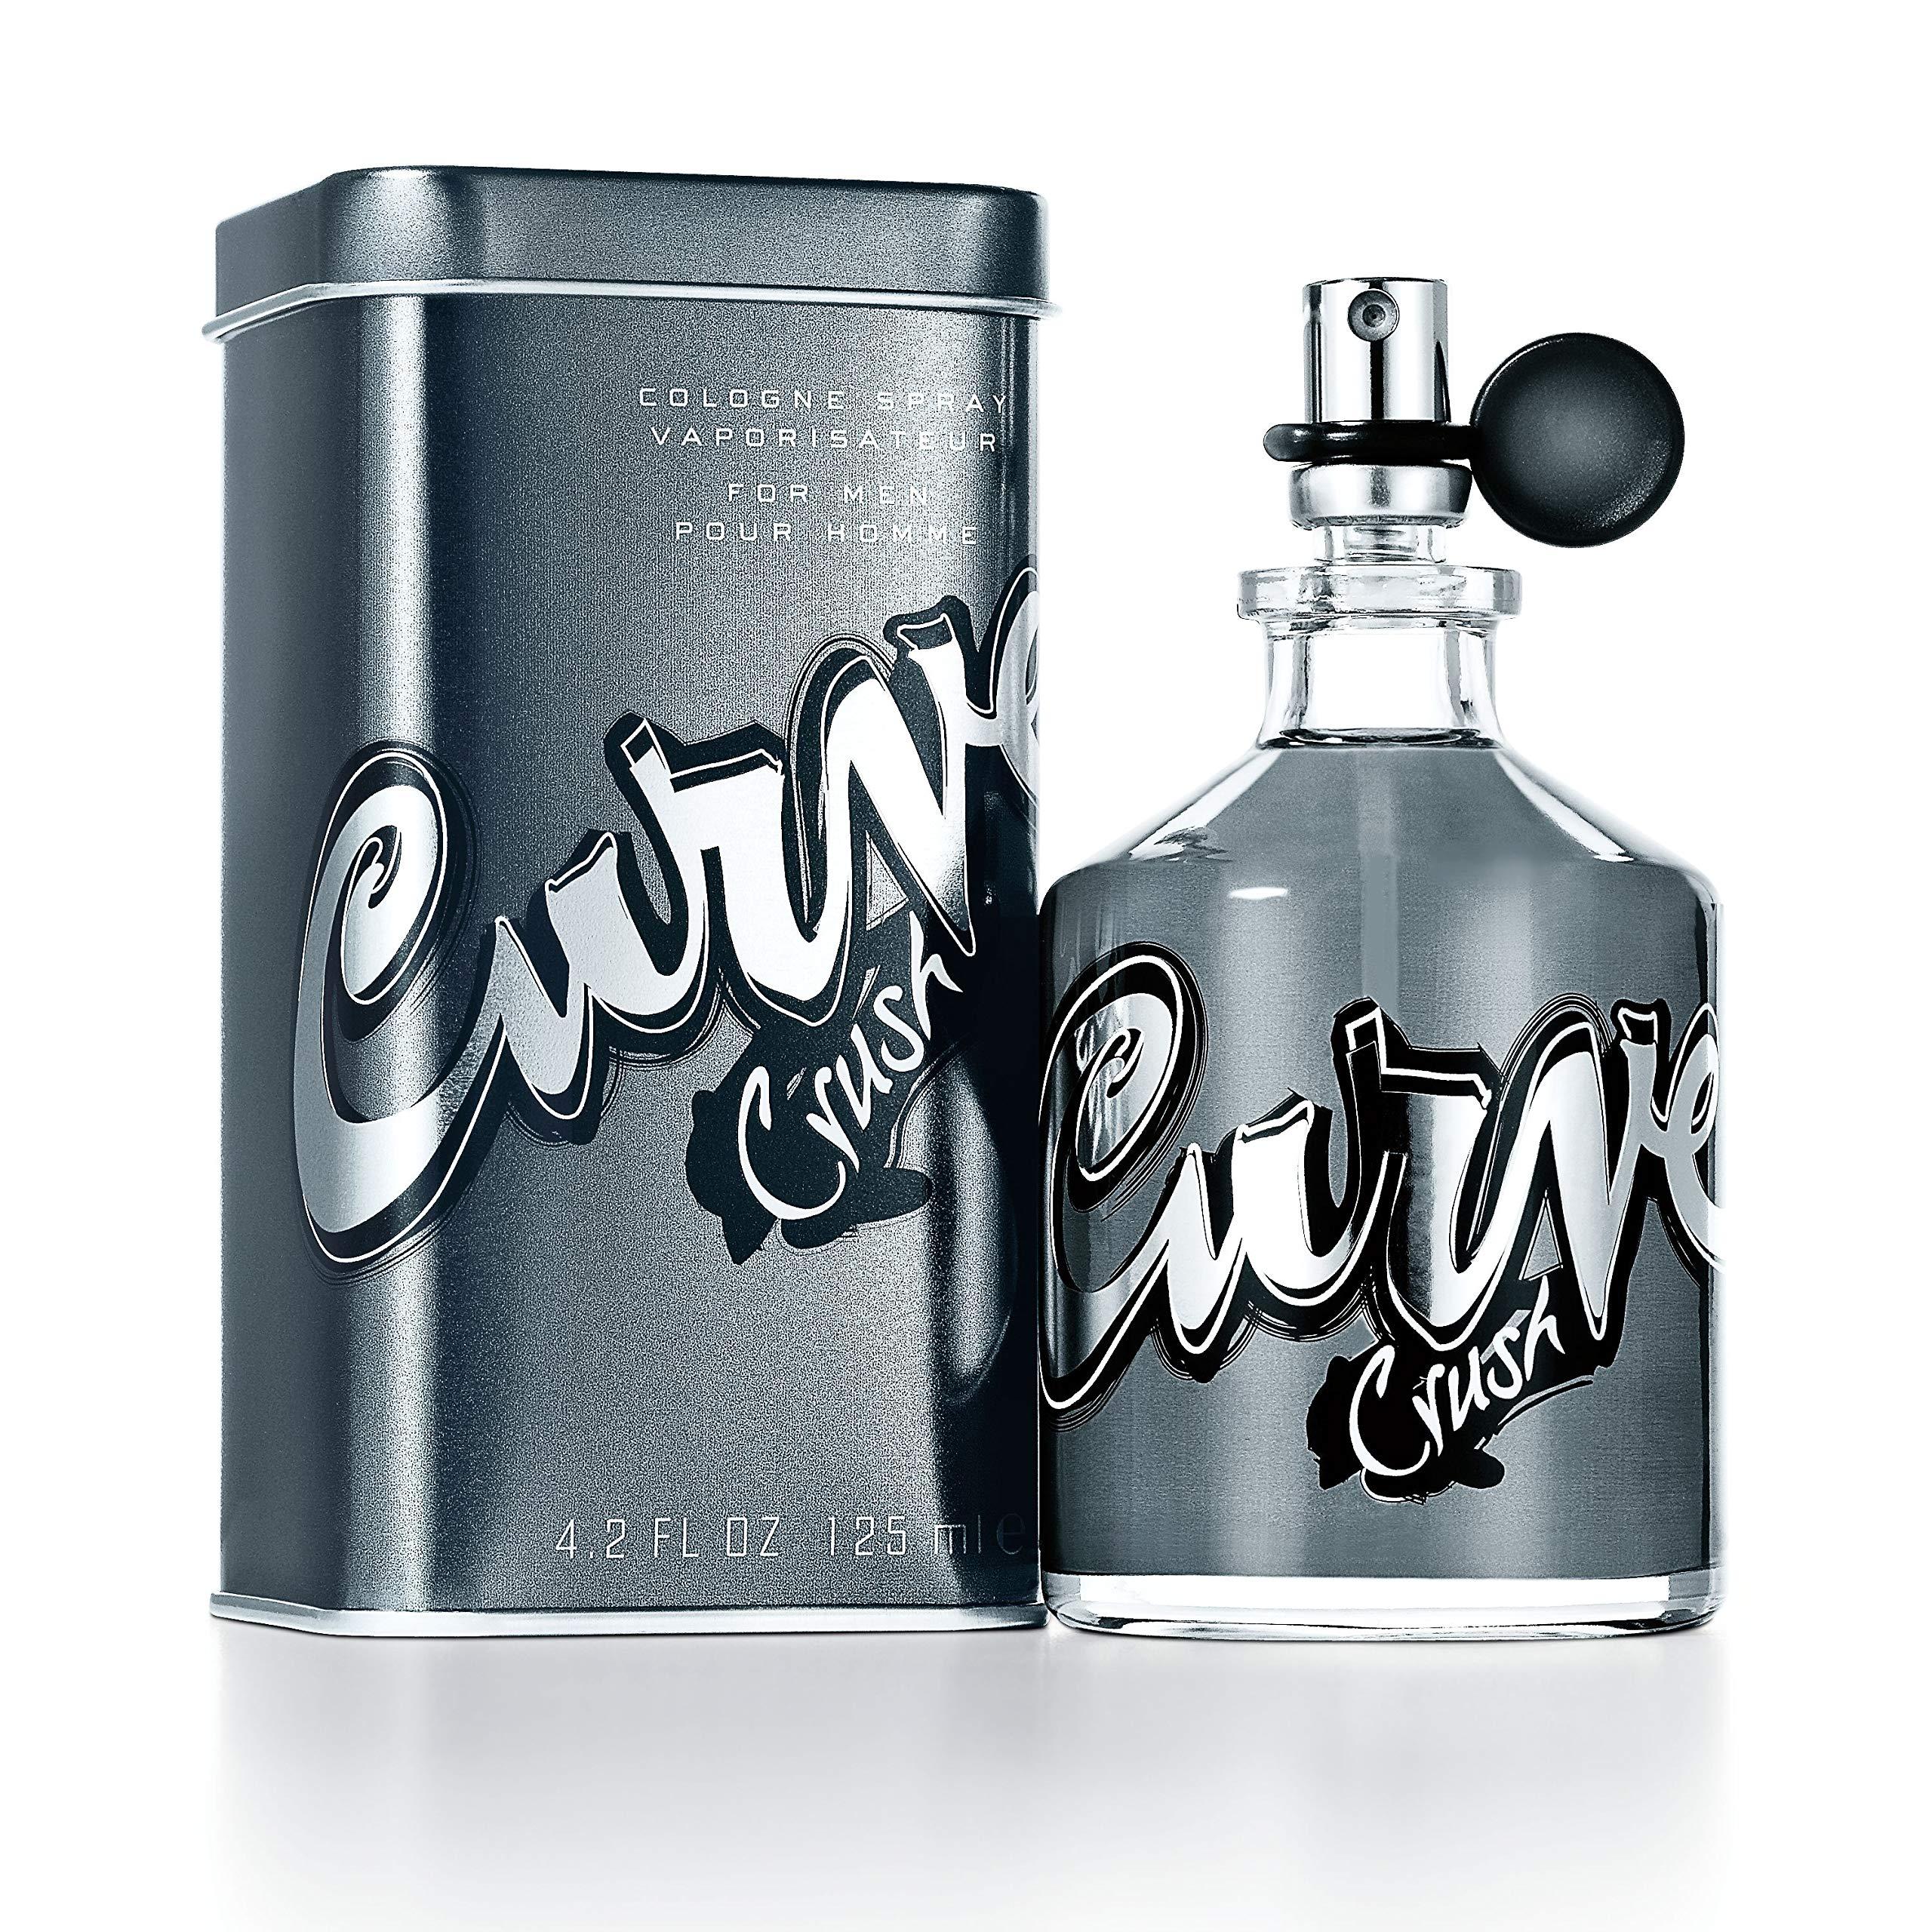 893ab14501 Amazon.com   Curve By Liz Claiborne For Men. Cologne Spray 6.8 oz ...